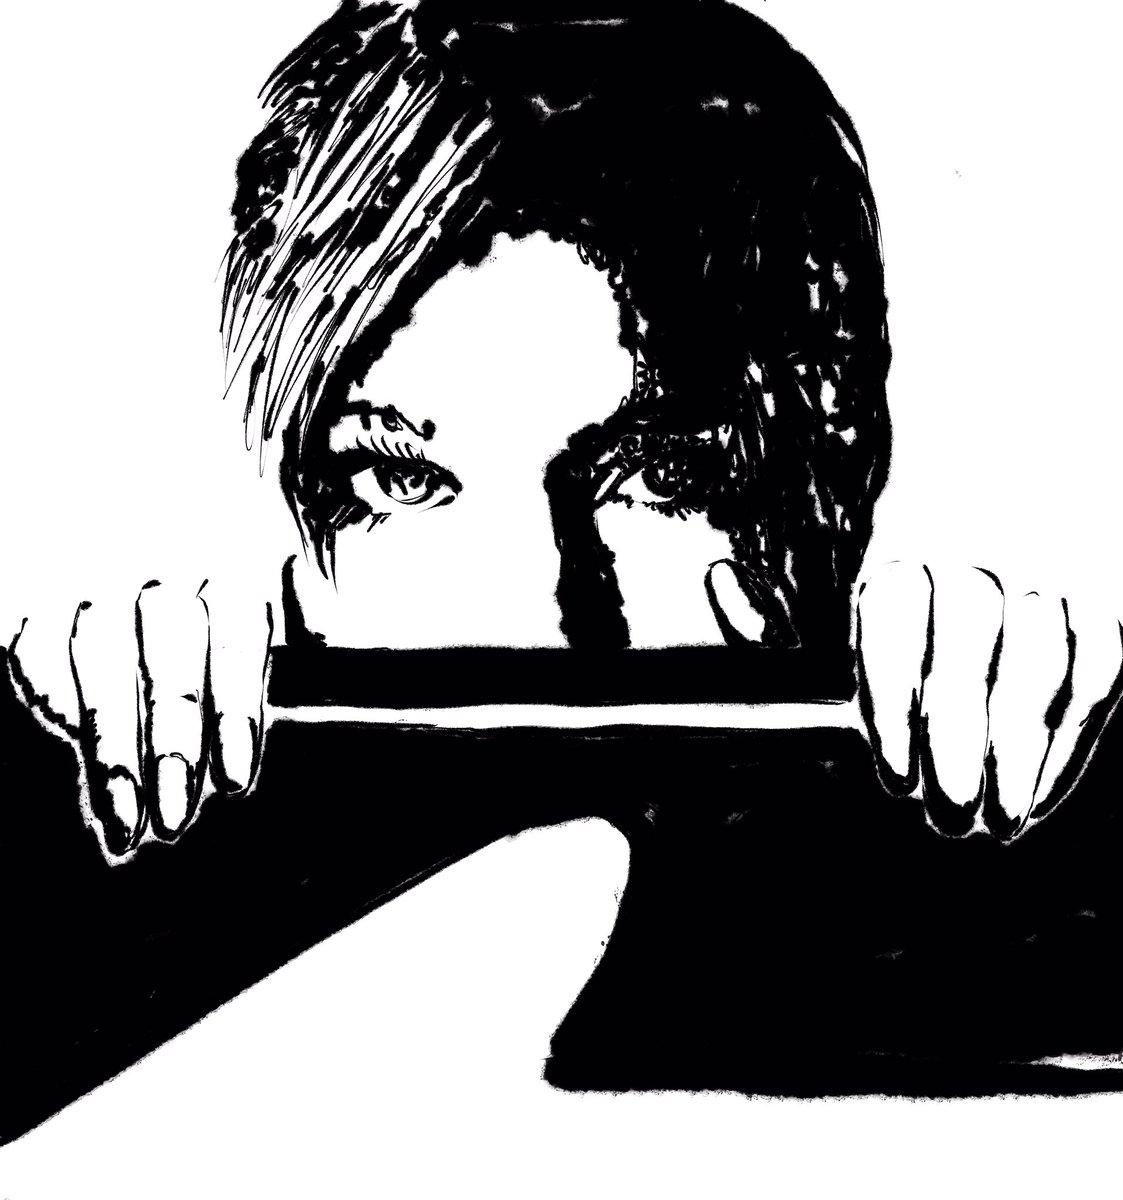 Sign. #illustration #art #drawing #collage #signpic.twitter.com/9Hr5xnzcWJ